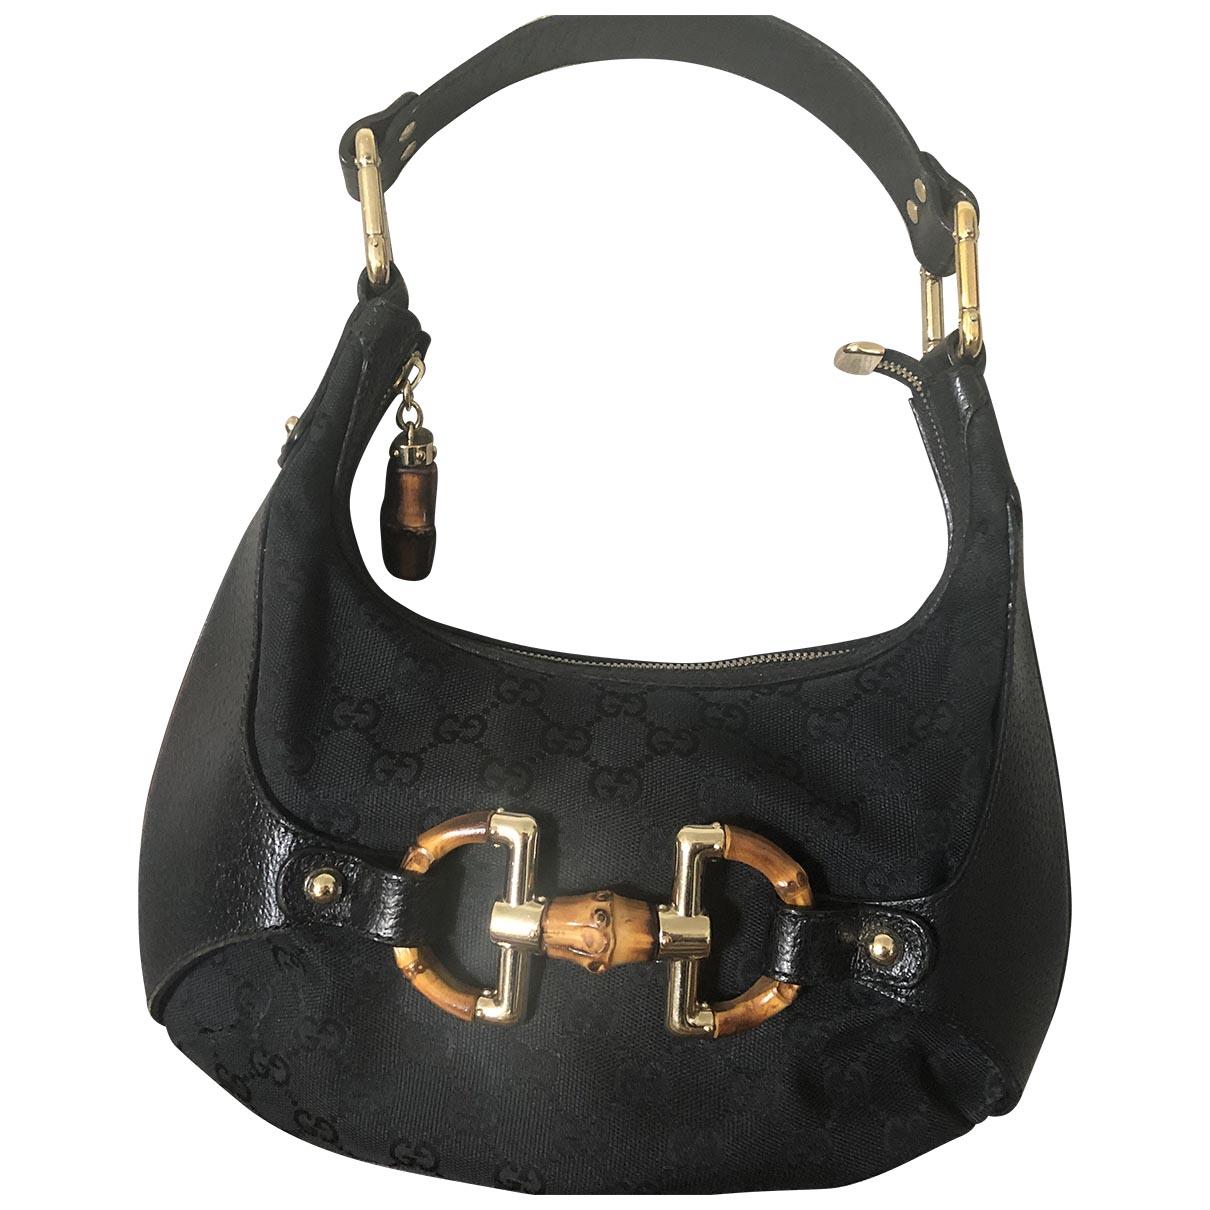 Gucci Bamboo Black Cloth handbag for Women N